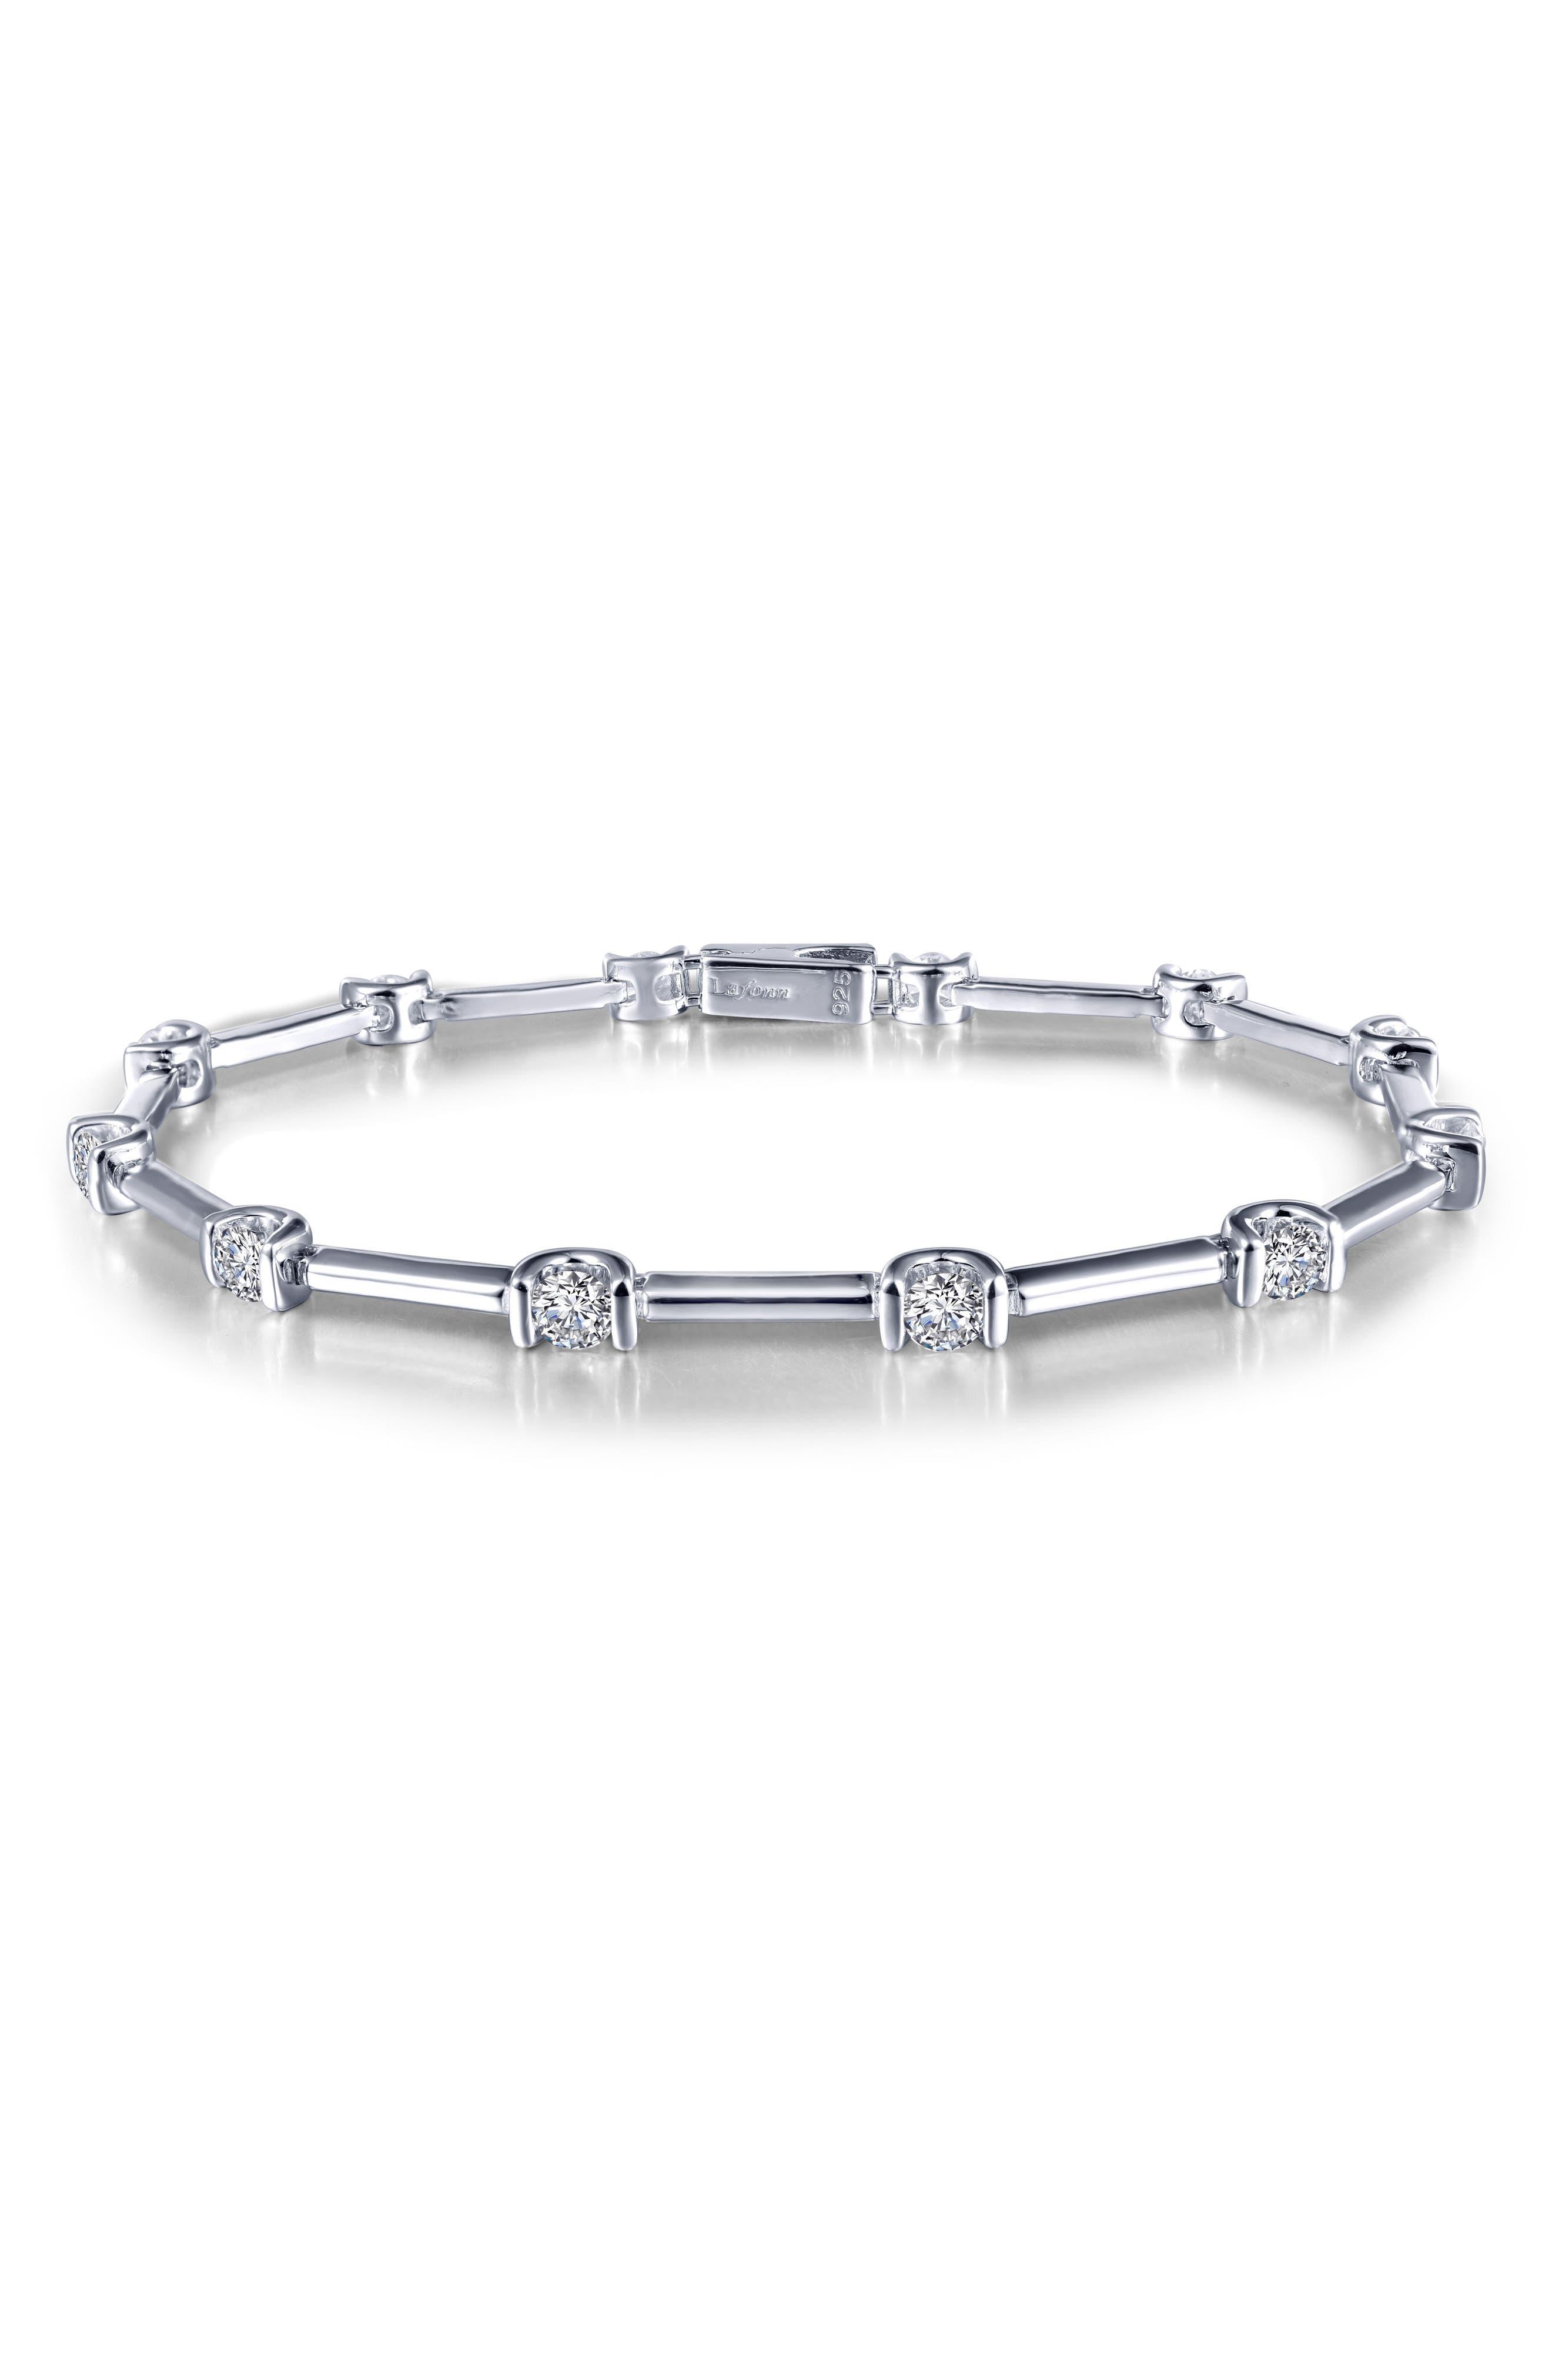 Simulated Diamond Bracelet,                         Main,                         color, Silver/ Clear